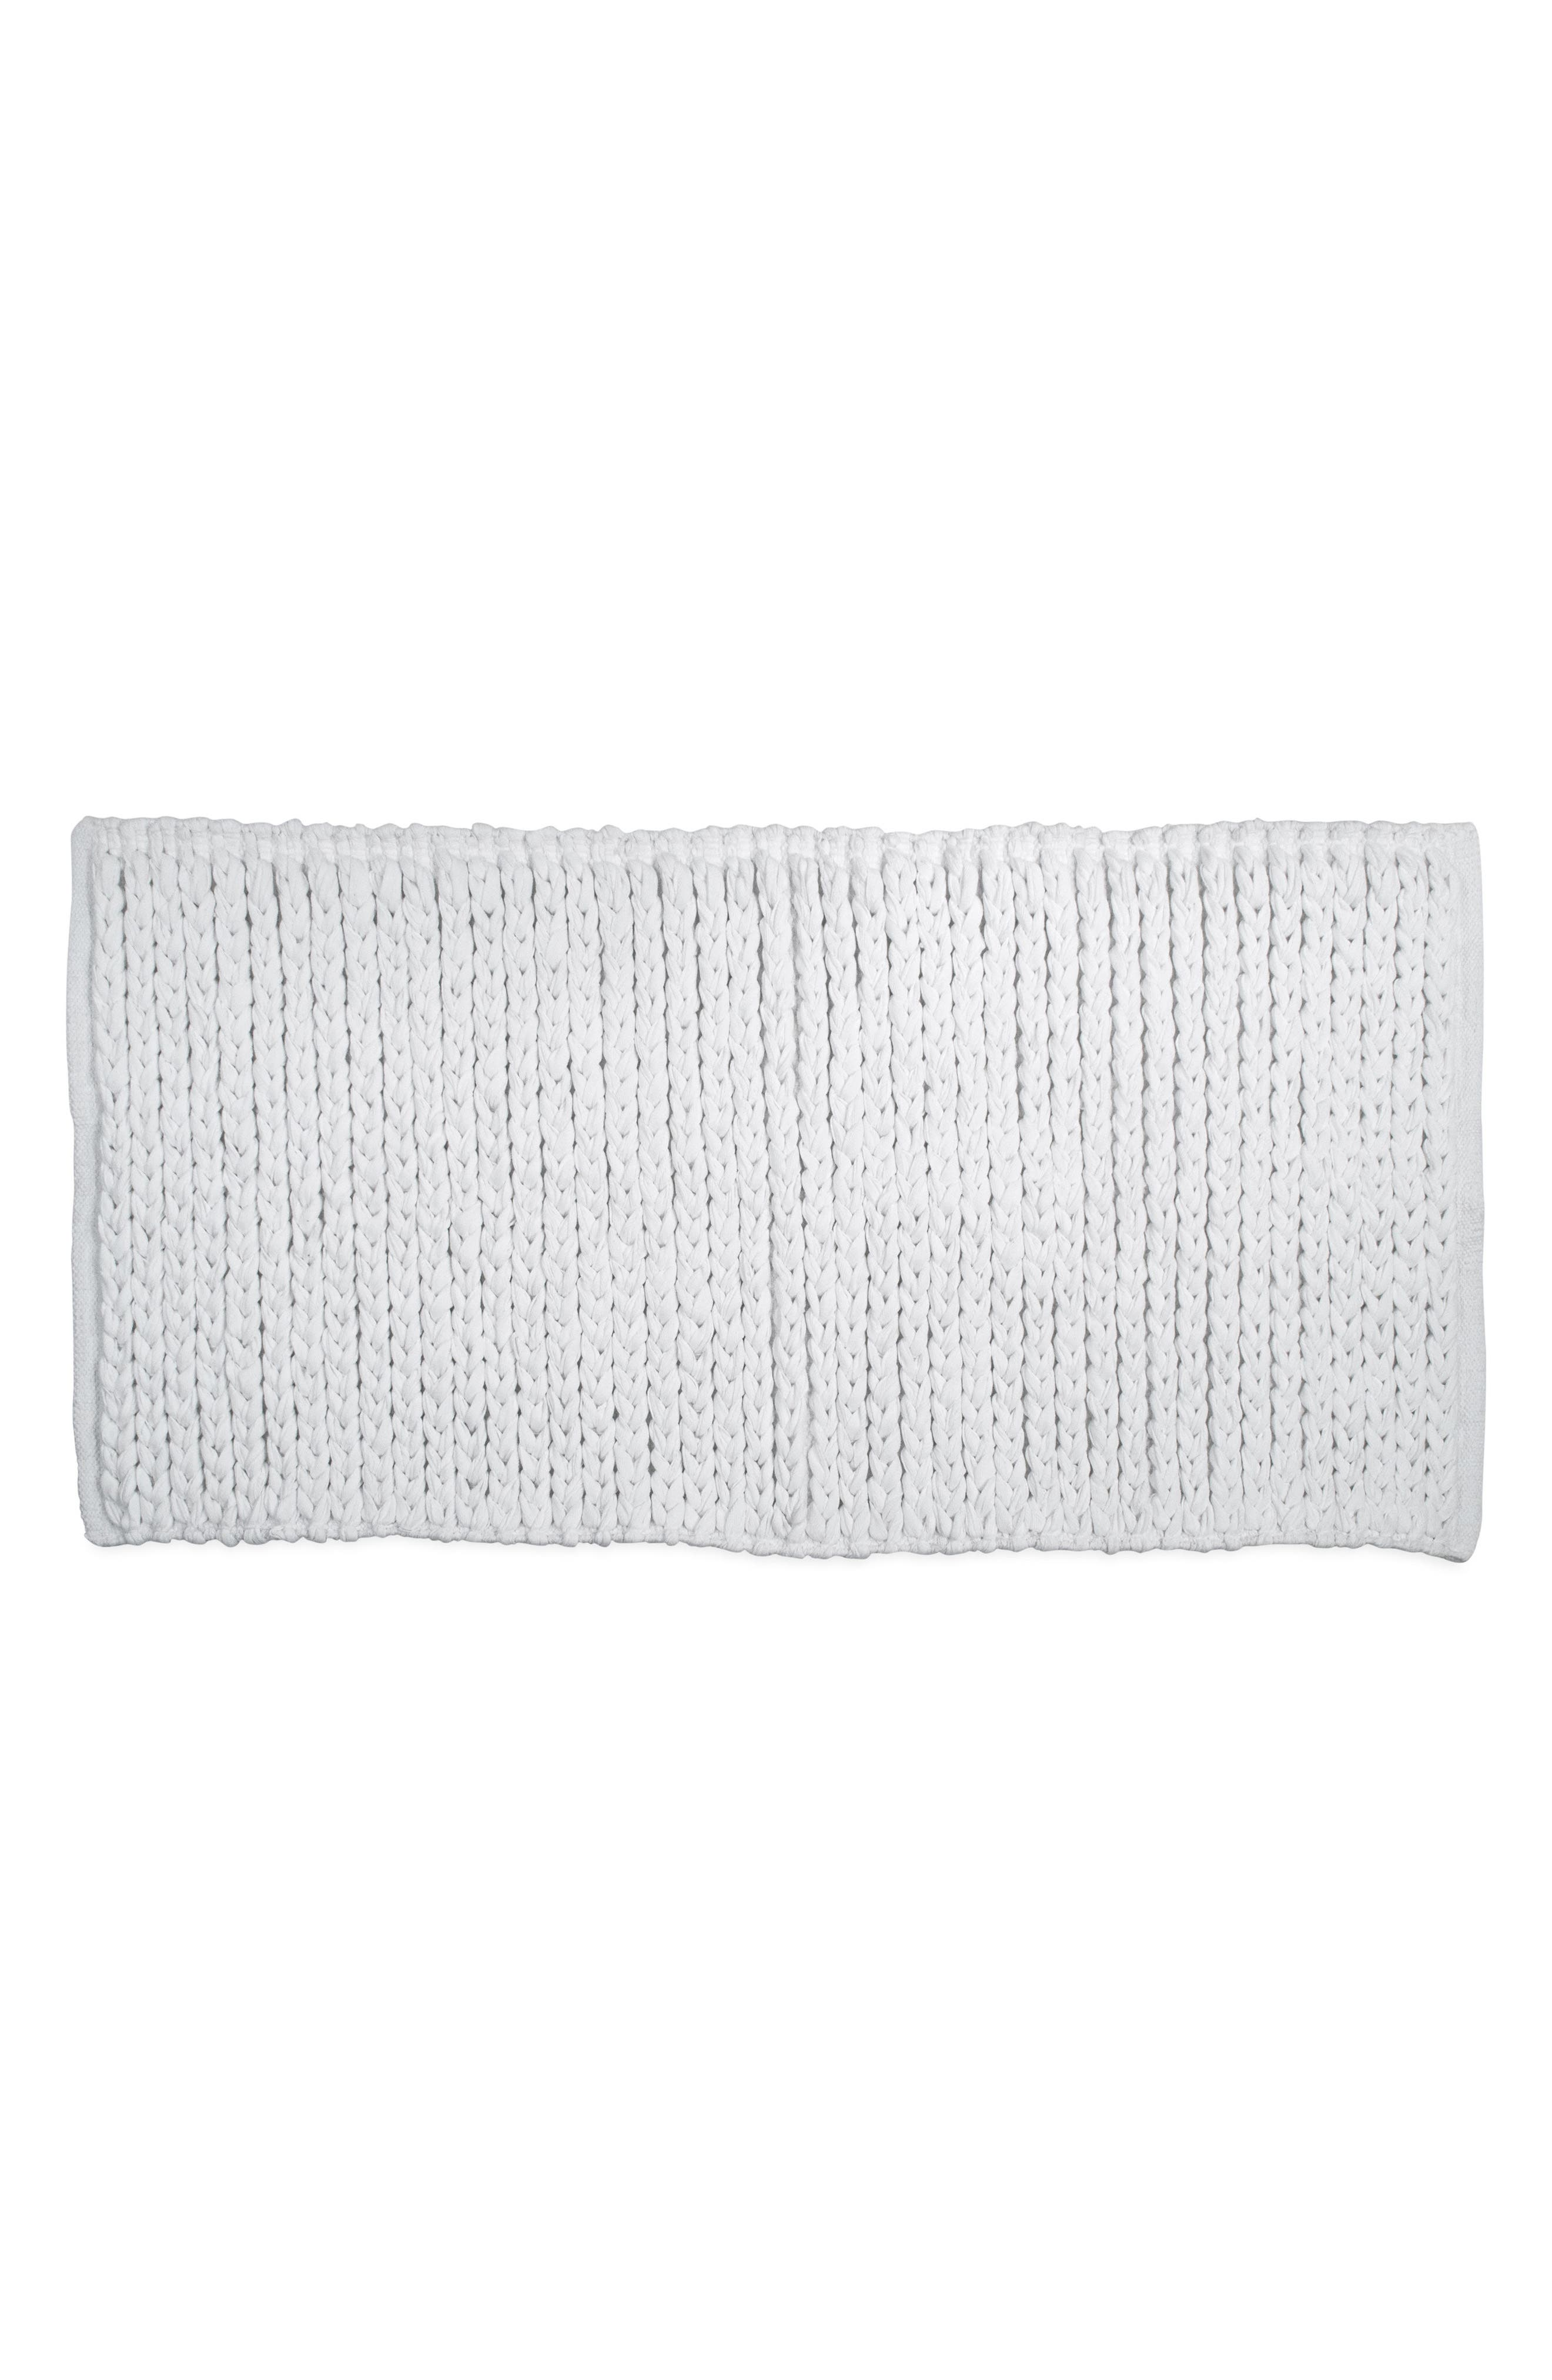 Bath Rug,                         Main,                         color, White